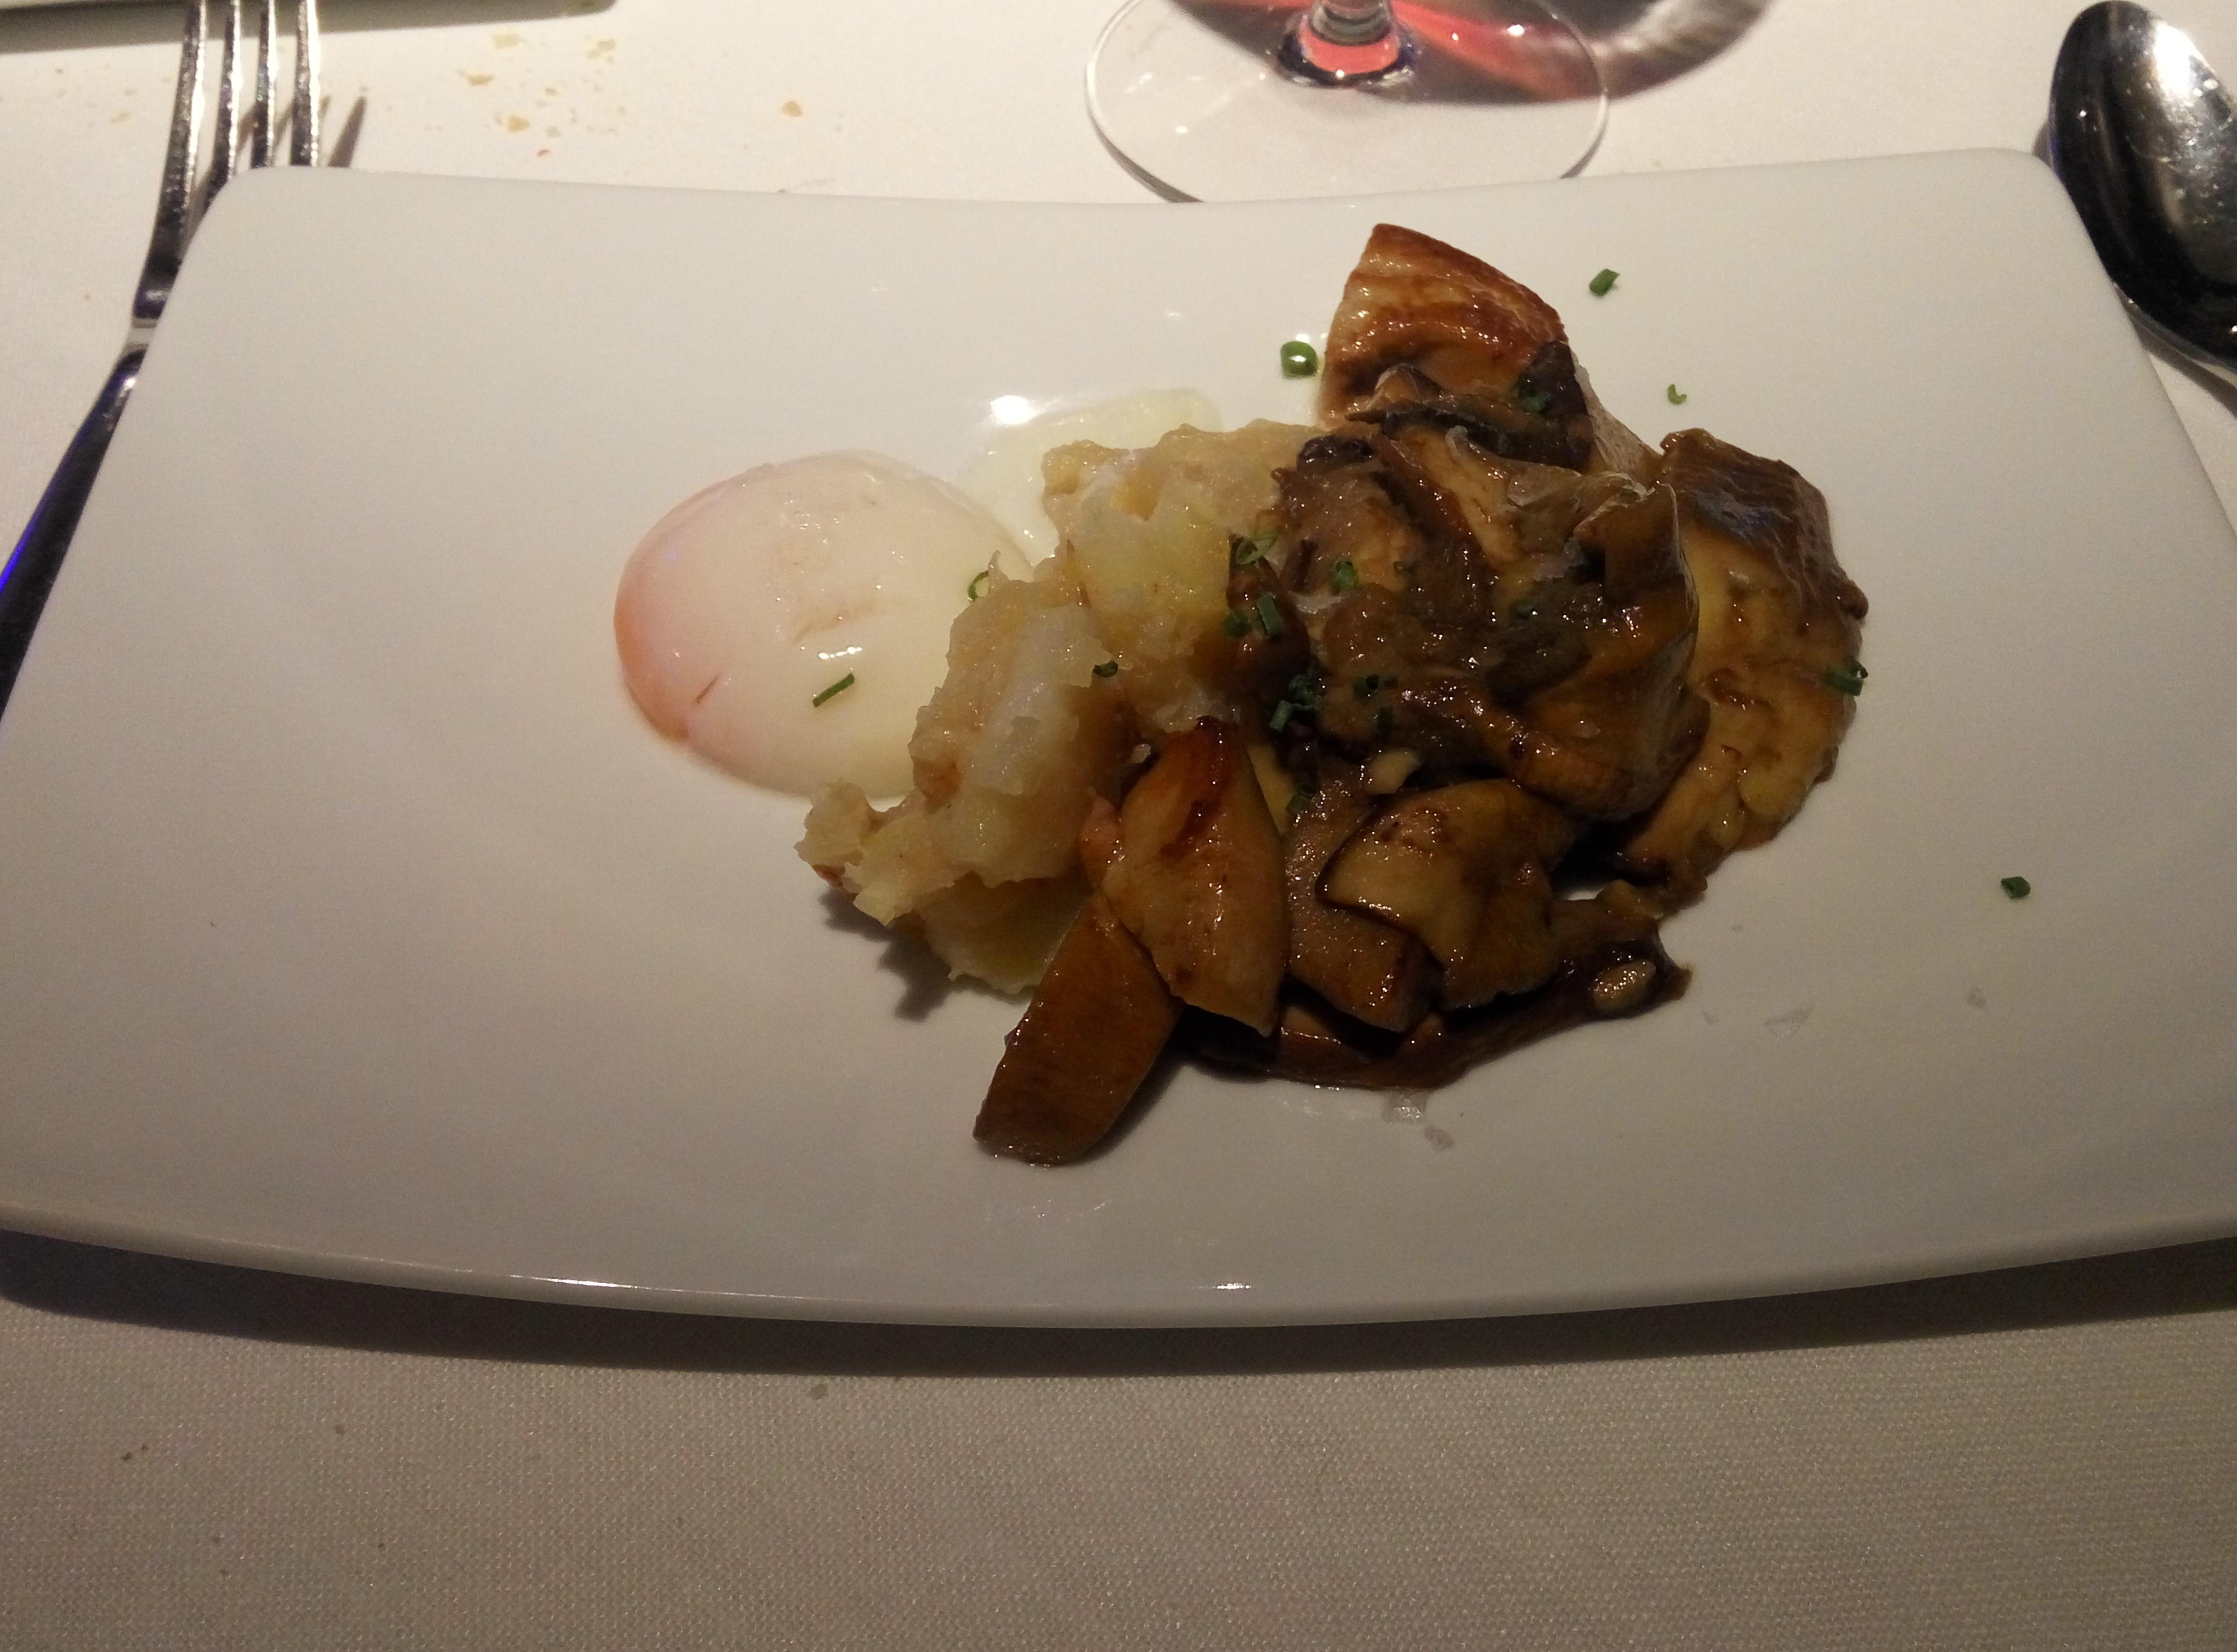 Restaurante Hotel Restaurante Jaizkibel Hongo fresco con patata, huevo y foie